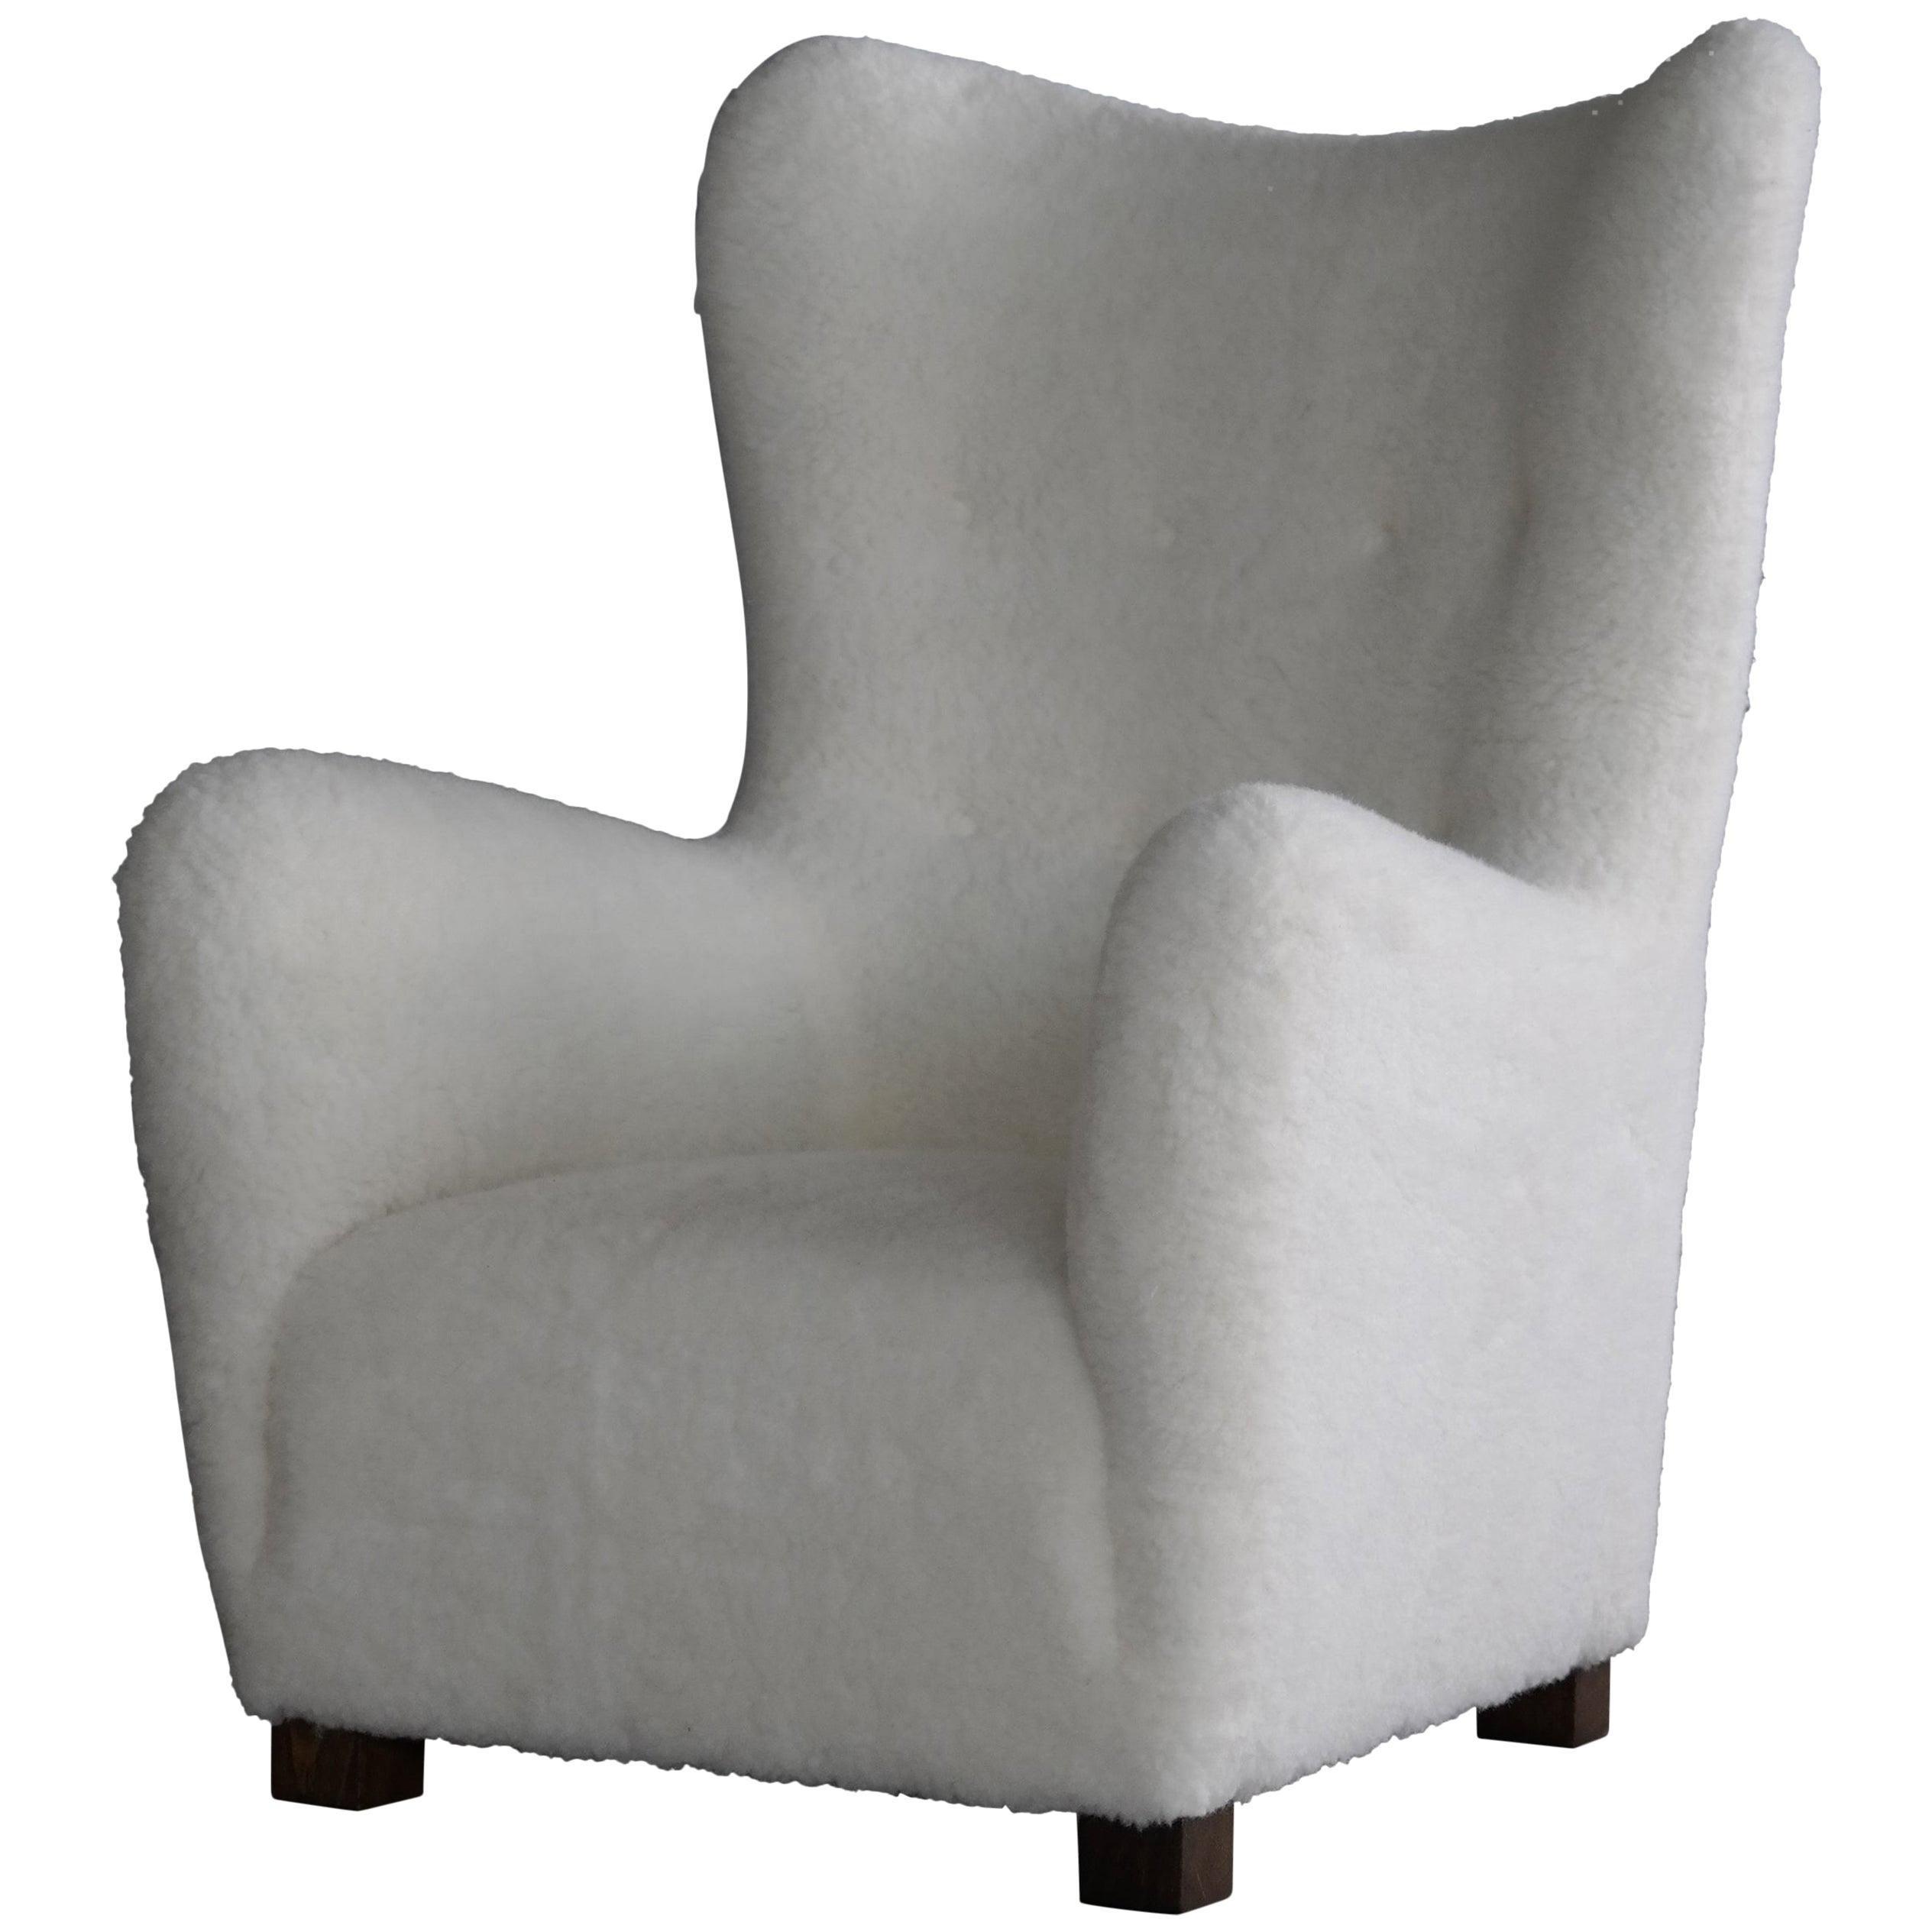 Fritz Hansen Model 1672 High Back Lounge Chair in Lambswool, Denmark, 1940s